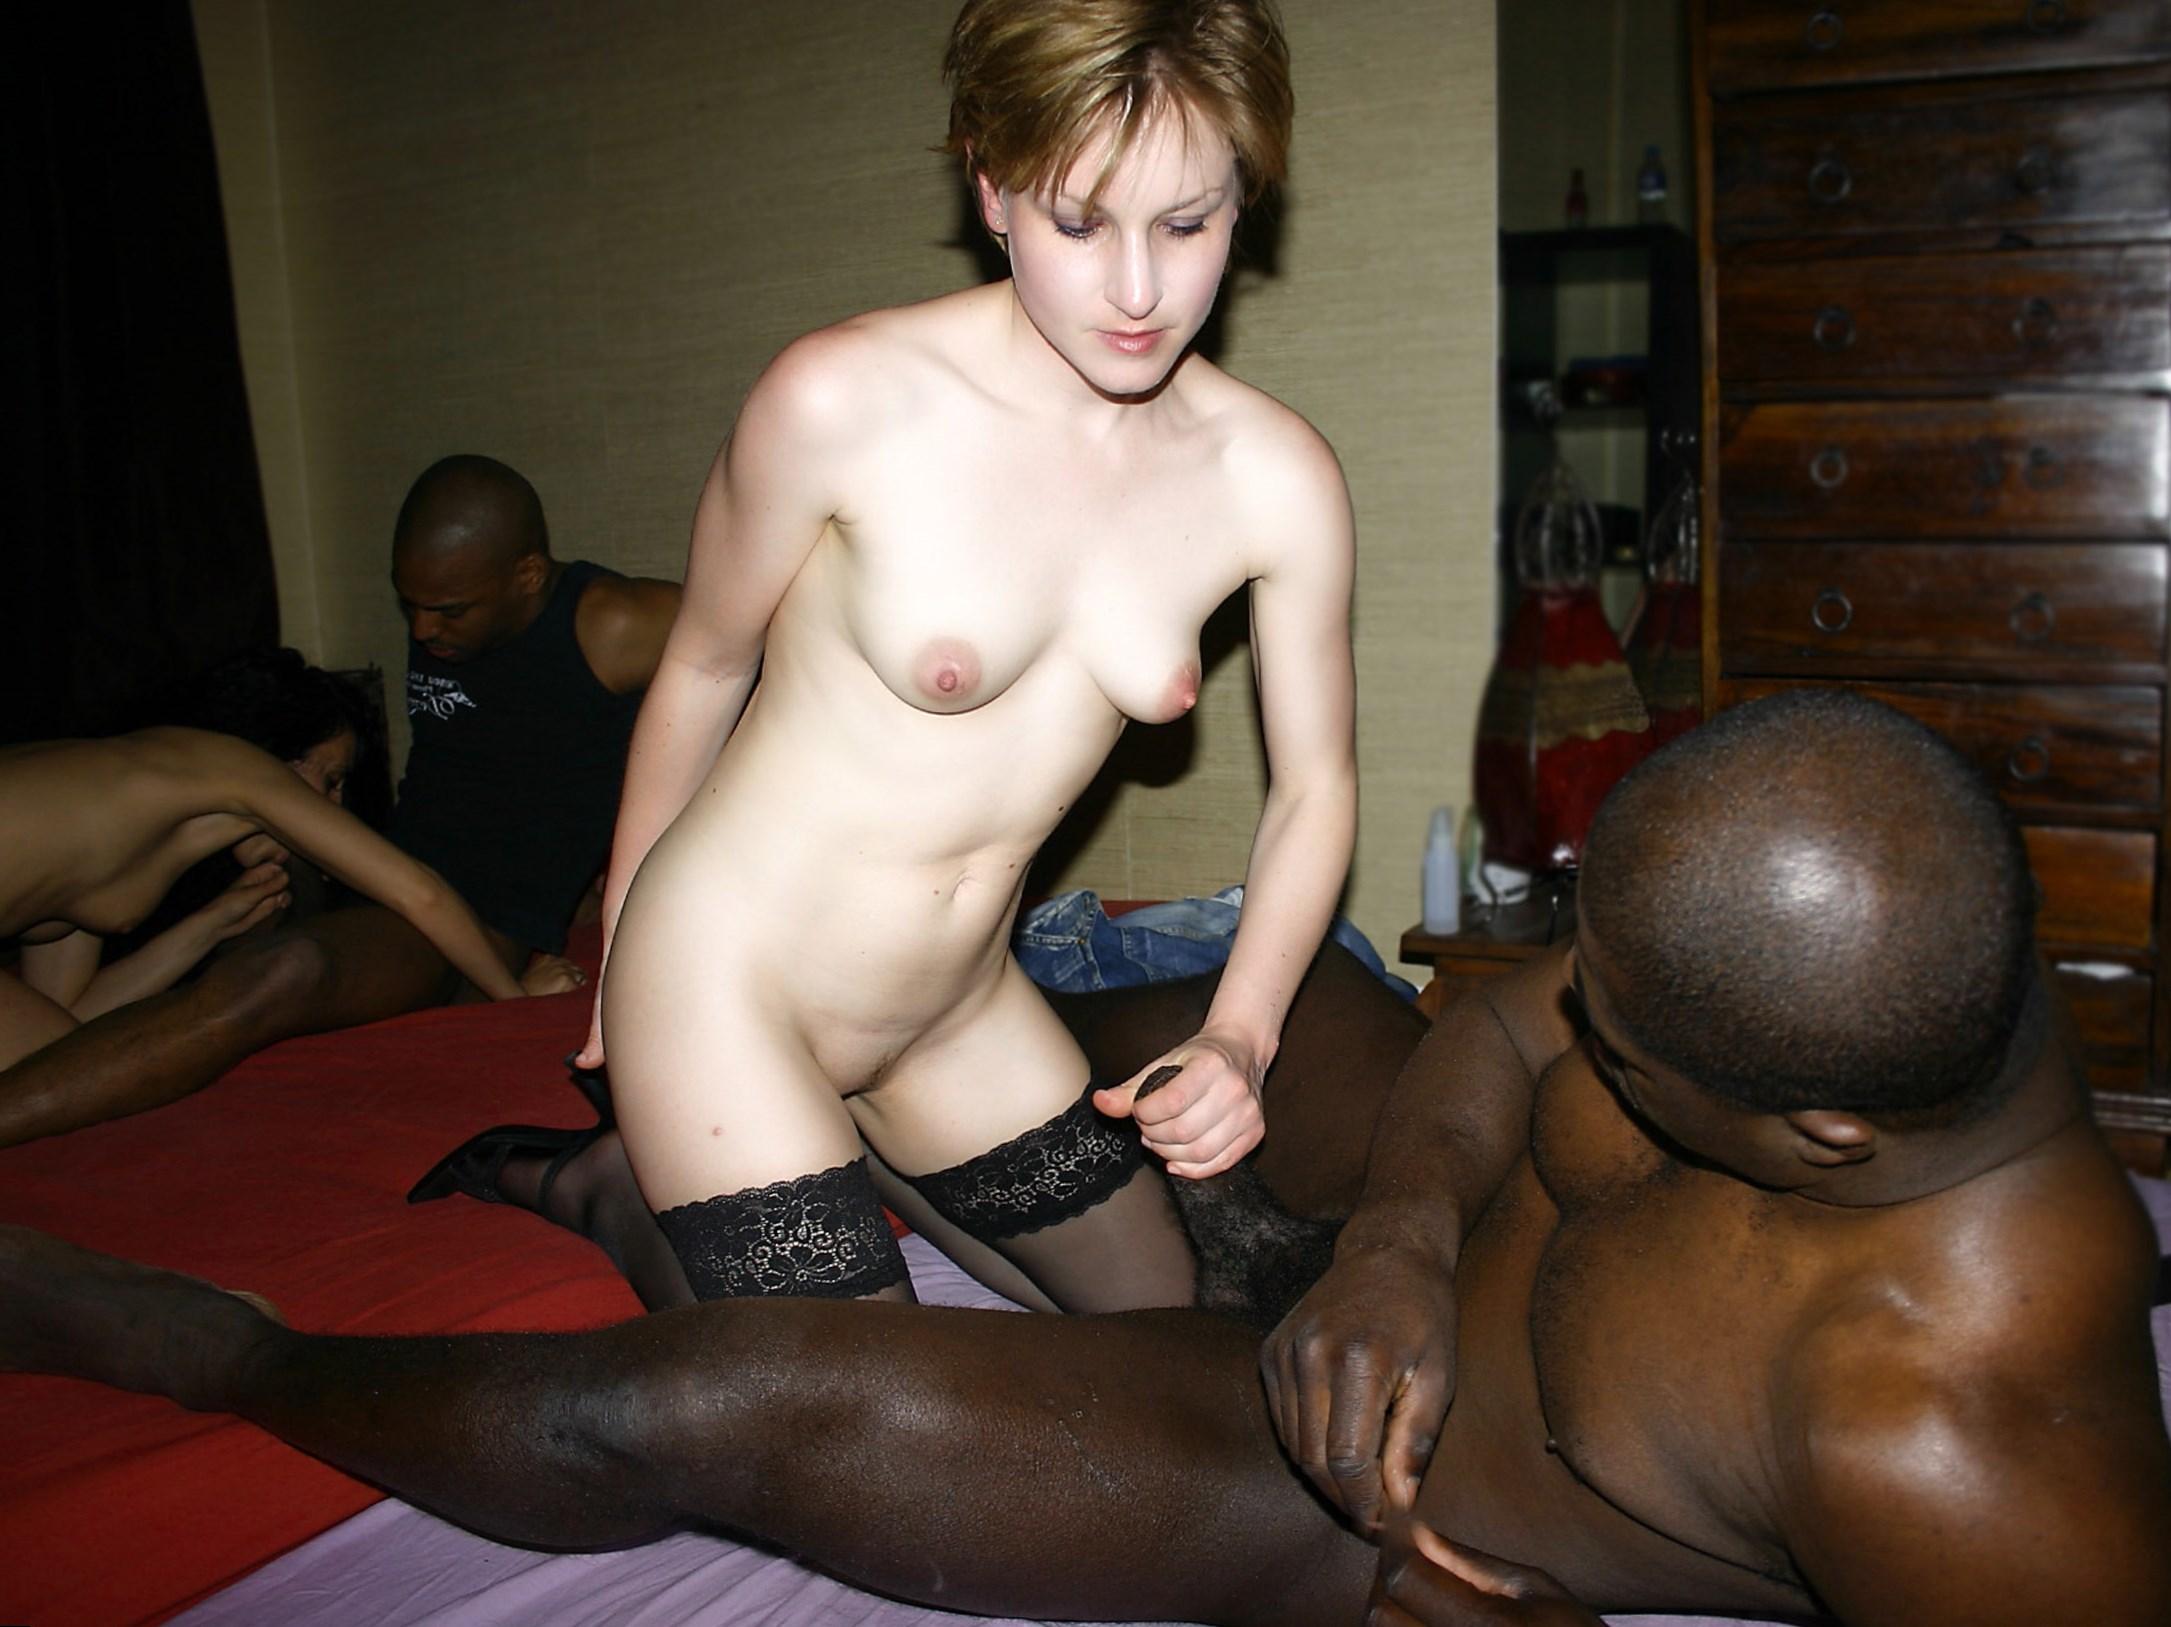 Amateur porn interracial community, movie swingers club owner